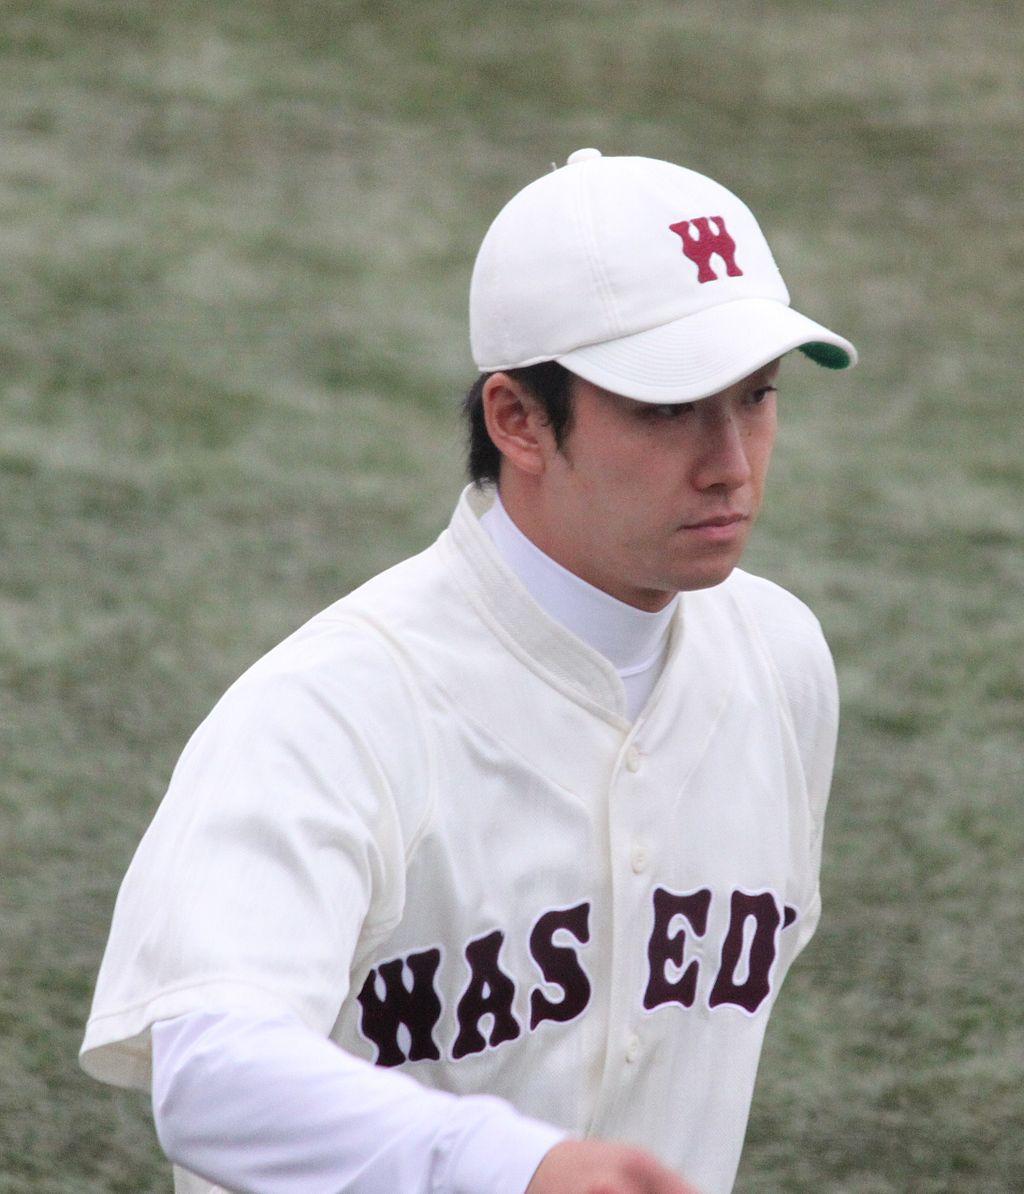 Yuki_Saitō,_pitcher_of_the_Waseda_Baseball_Club,_at_Meiji_Jingu_Stadium